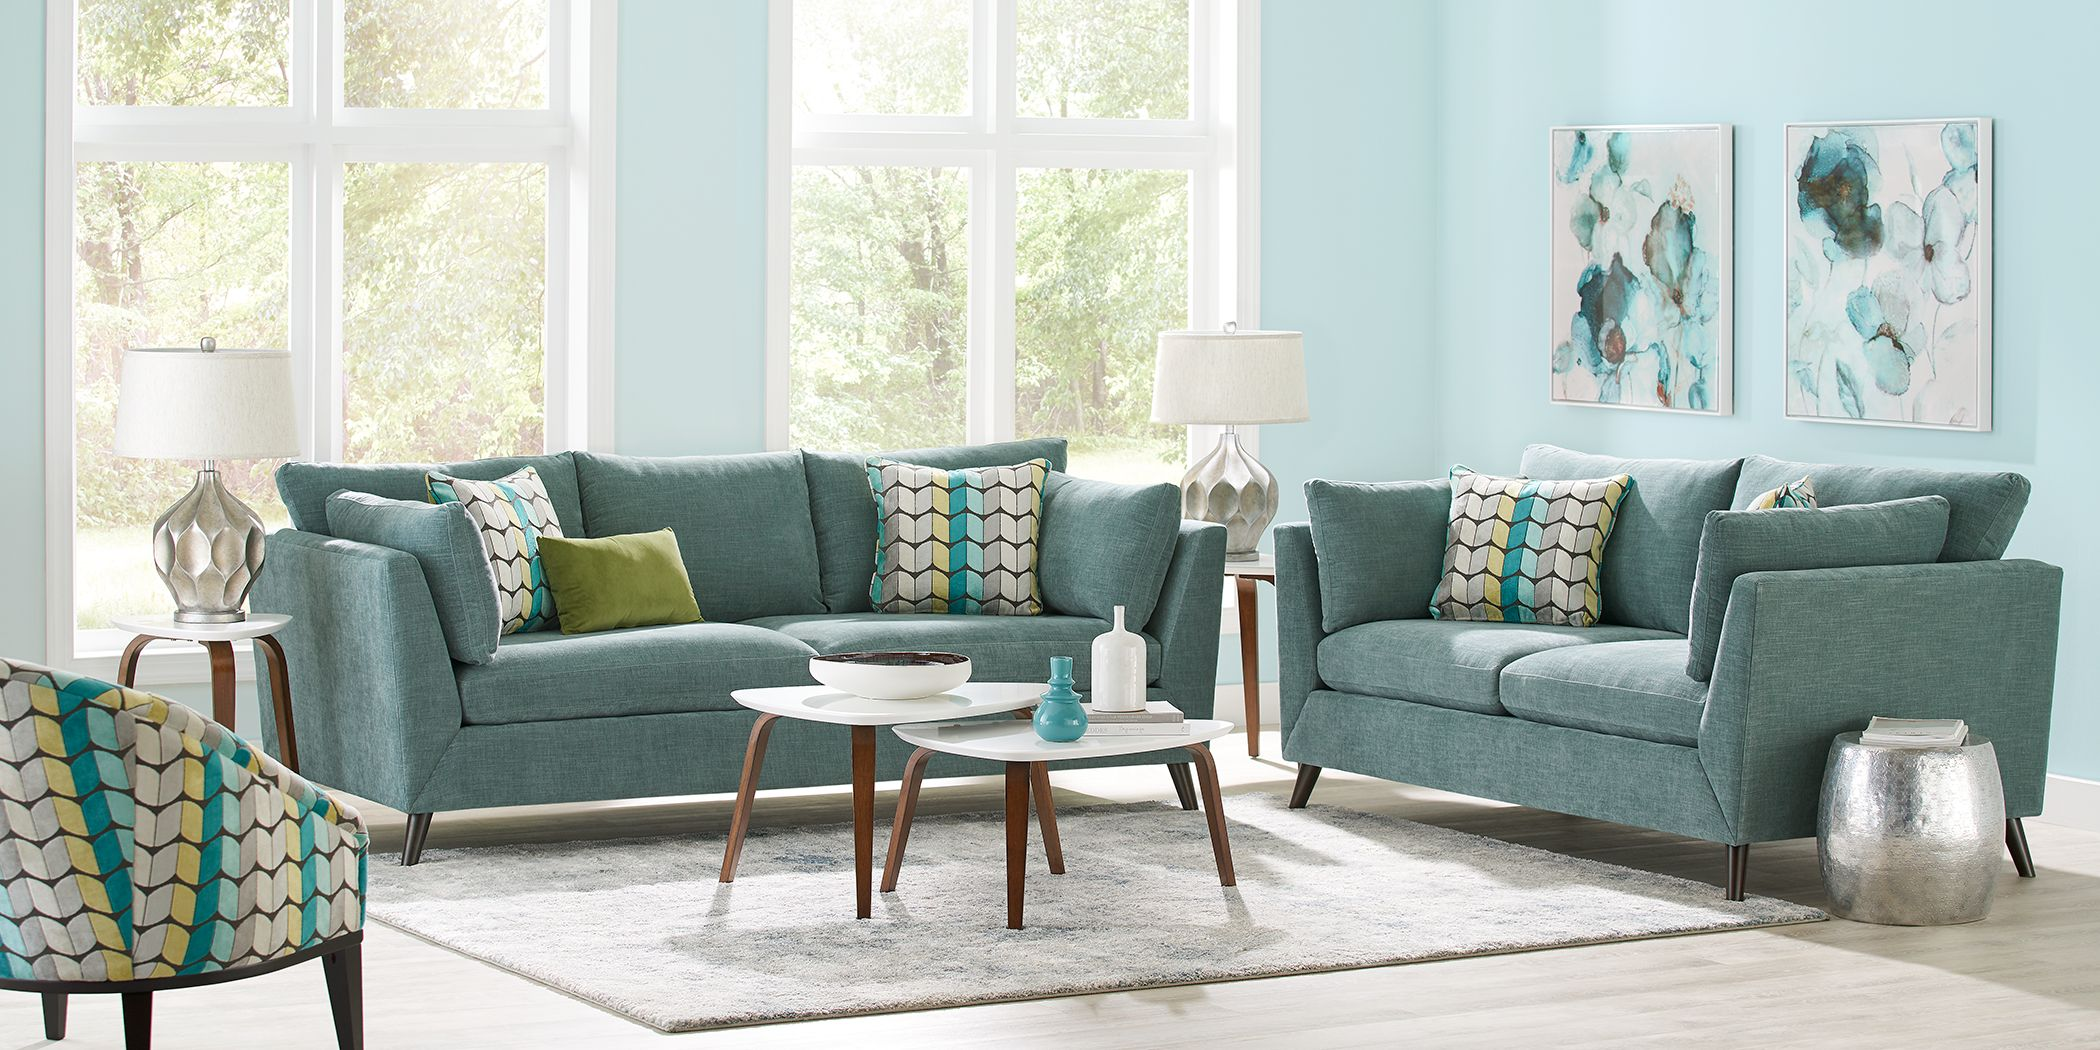 Sofia Vergara West Loft Teal 6 Pc Living Room